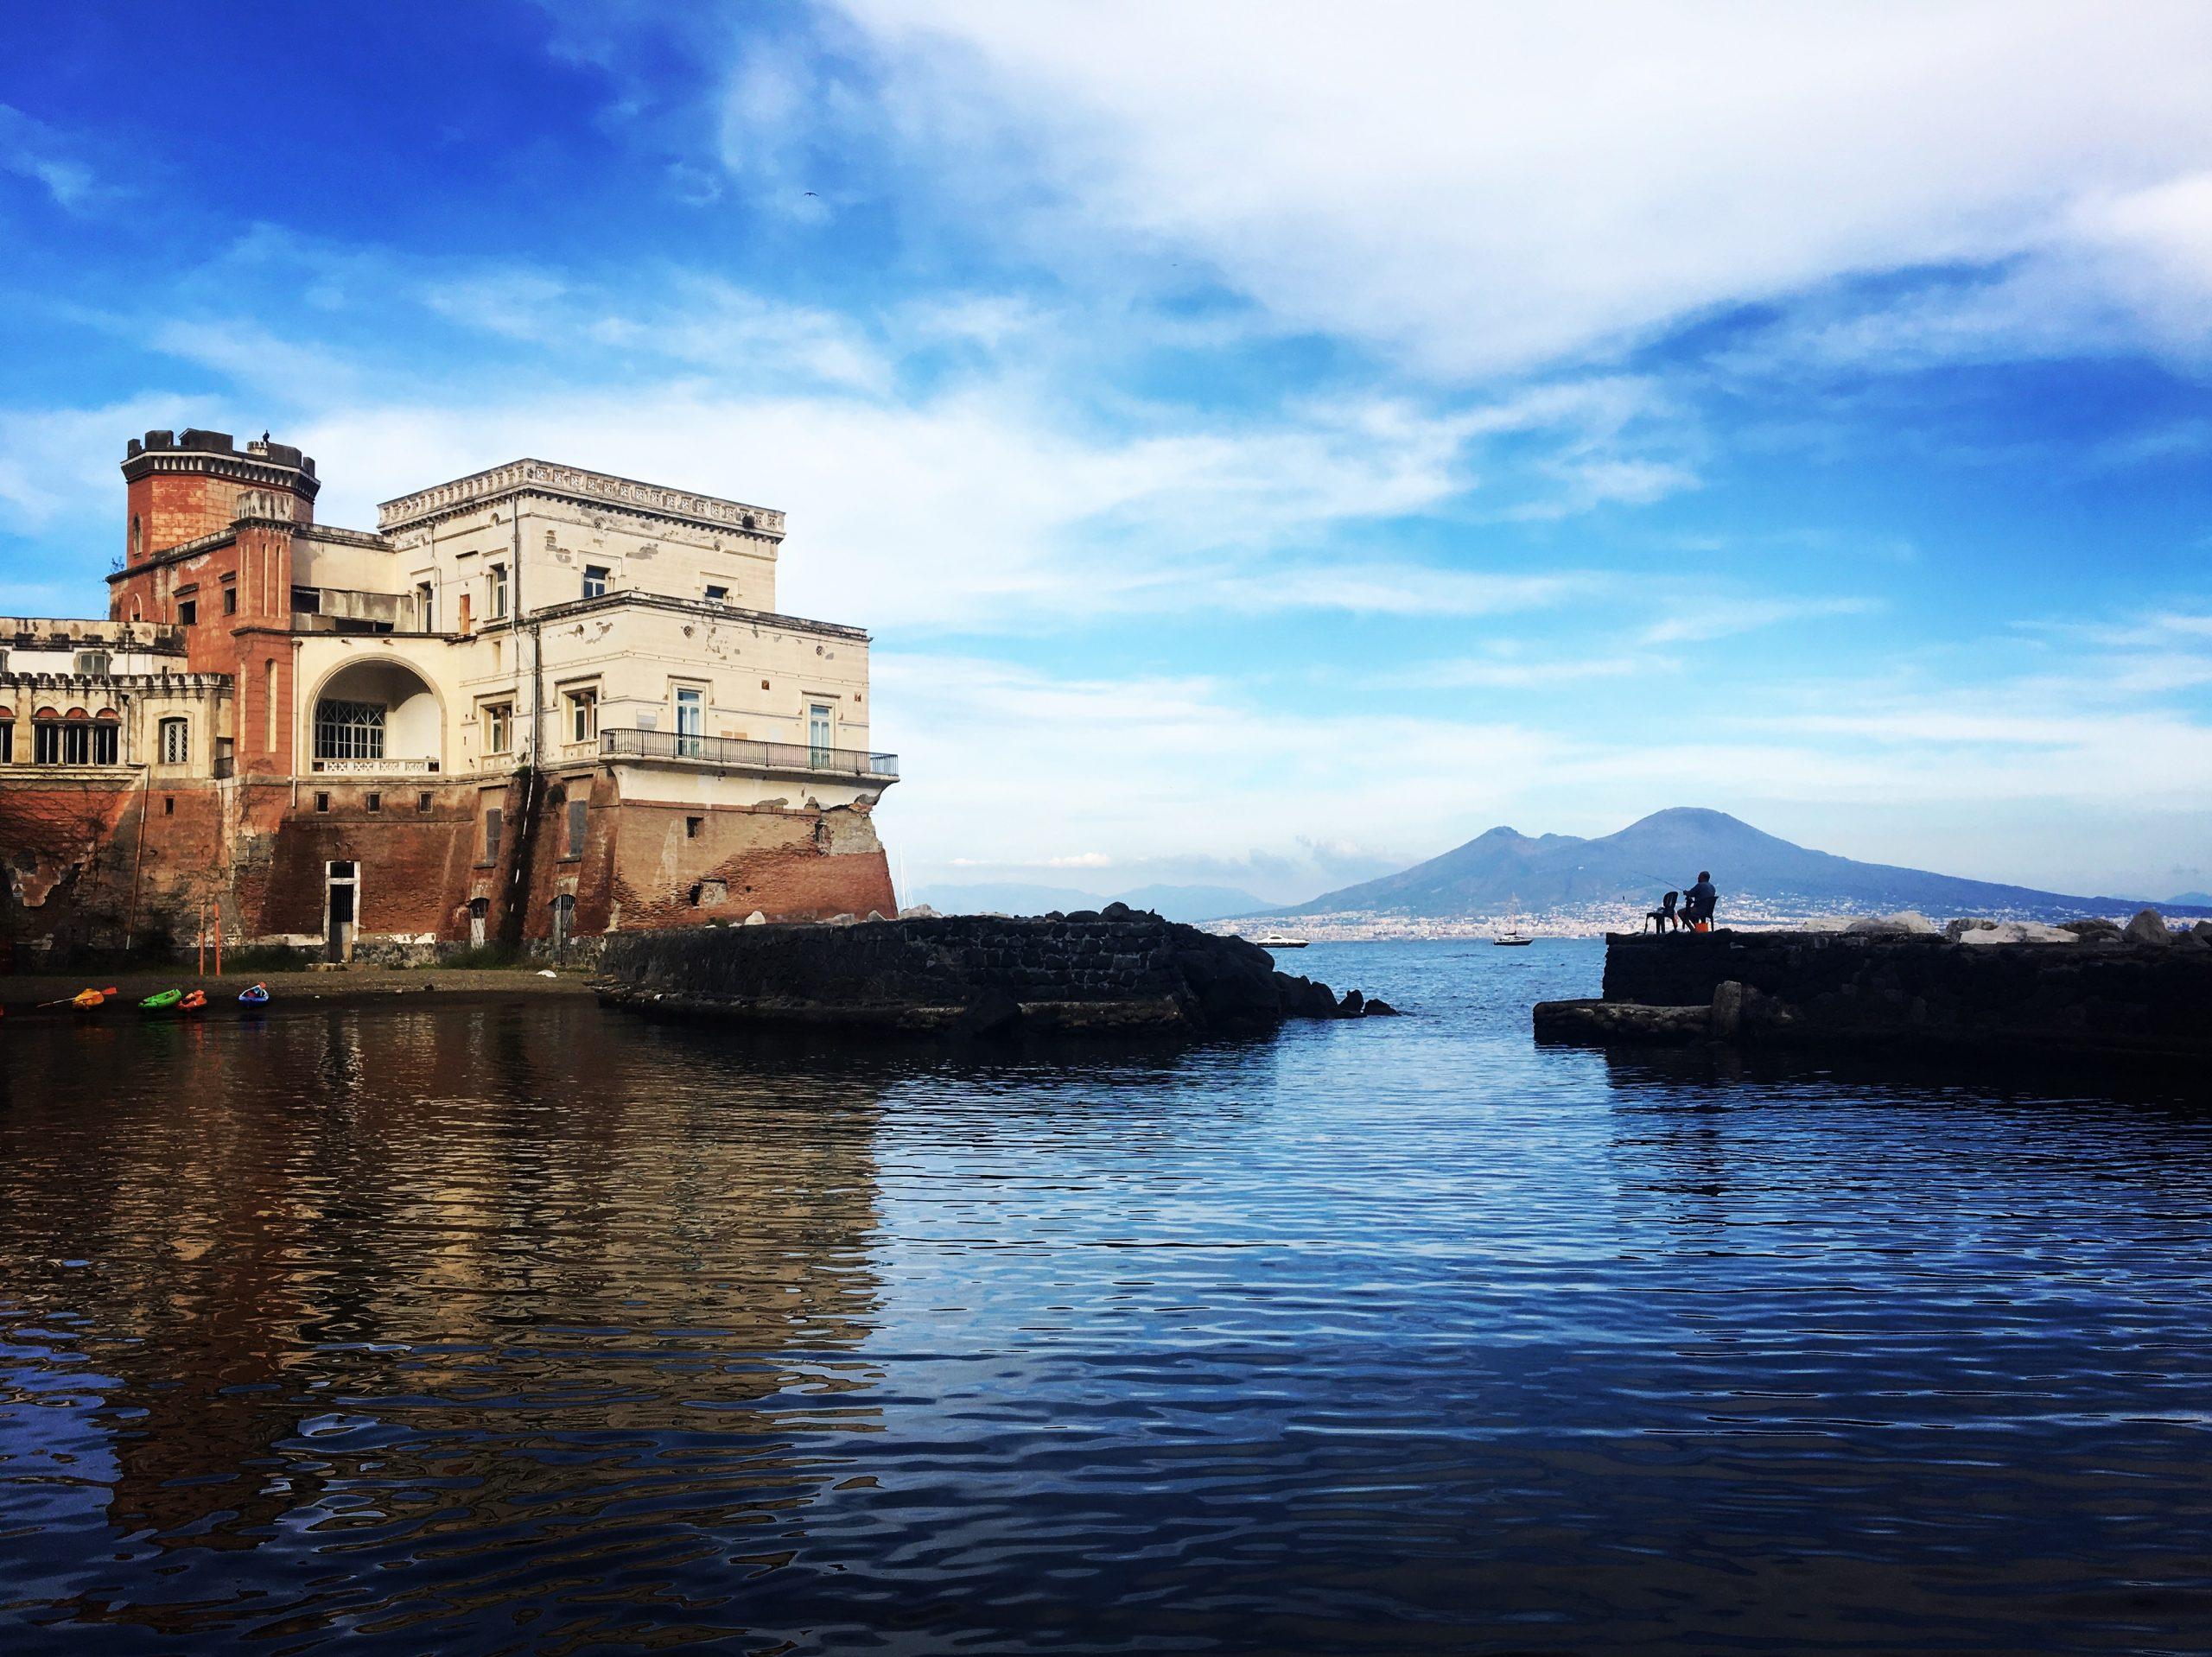 Weekend a Napoli: il mio itinerario